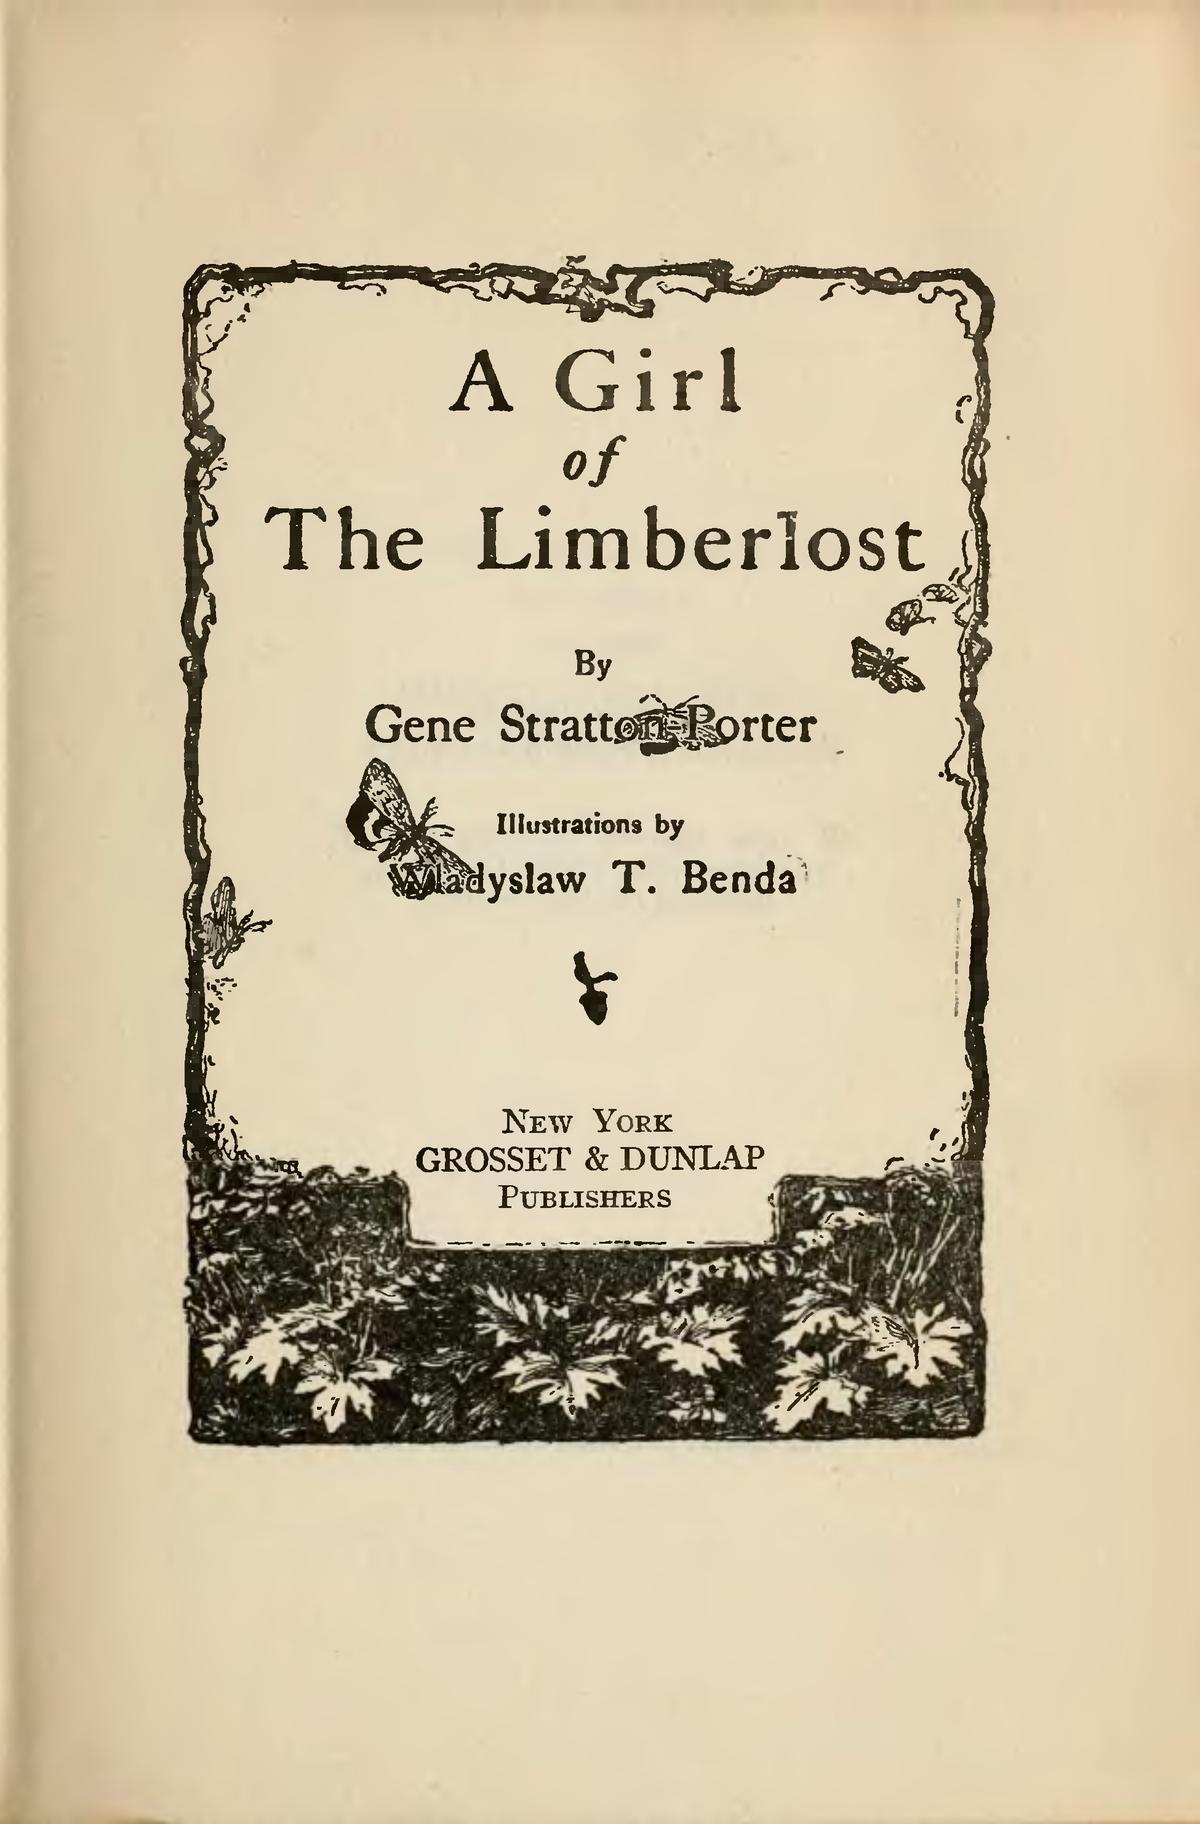 A Girl of the Limberlost (novel) - Wikipedia